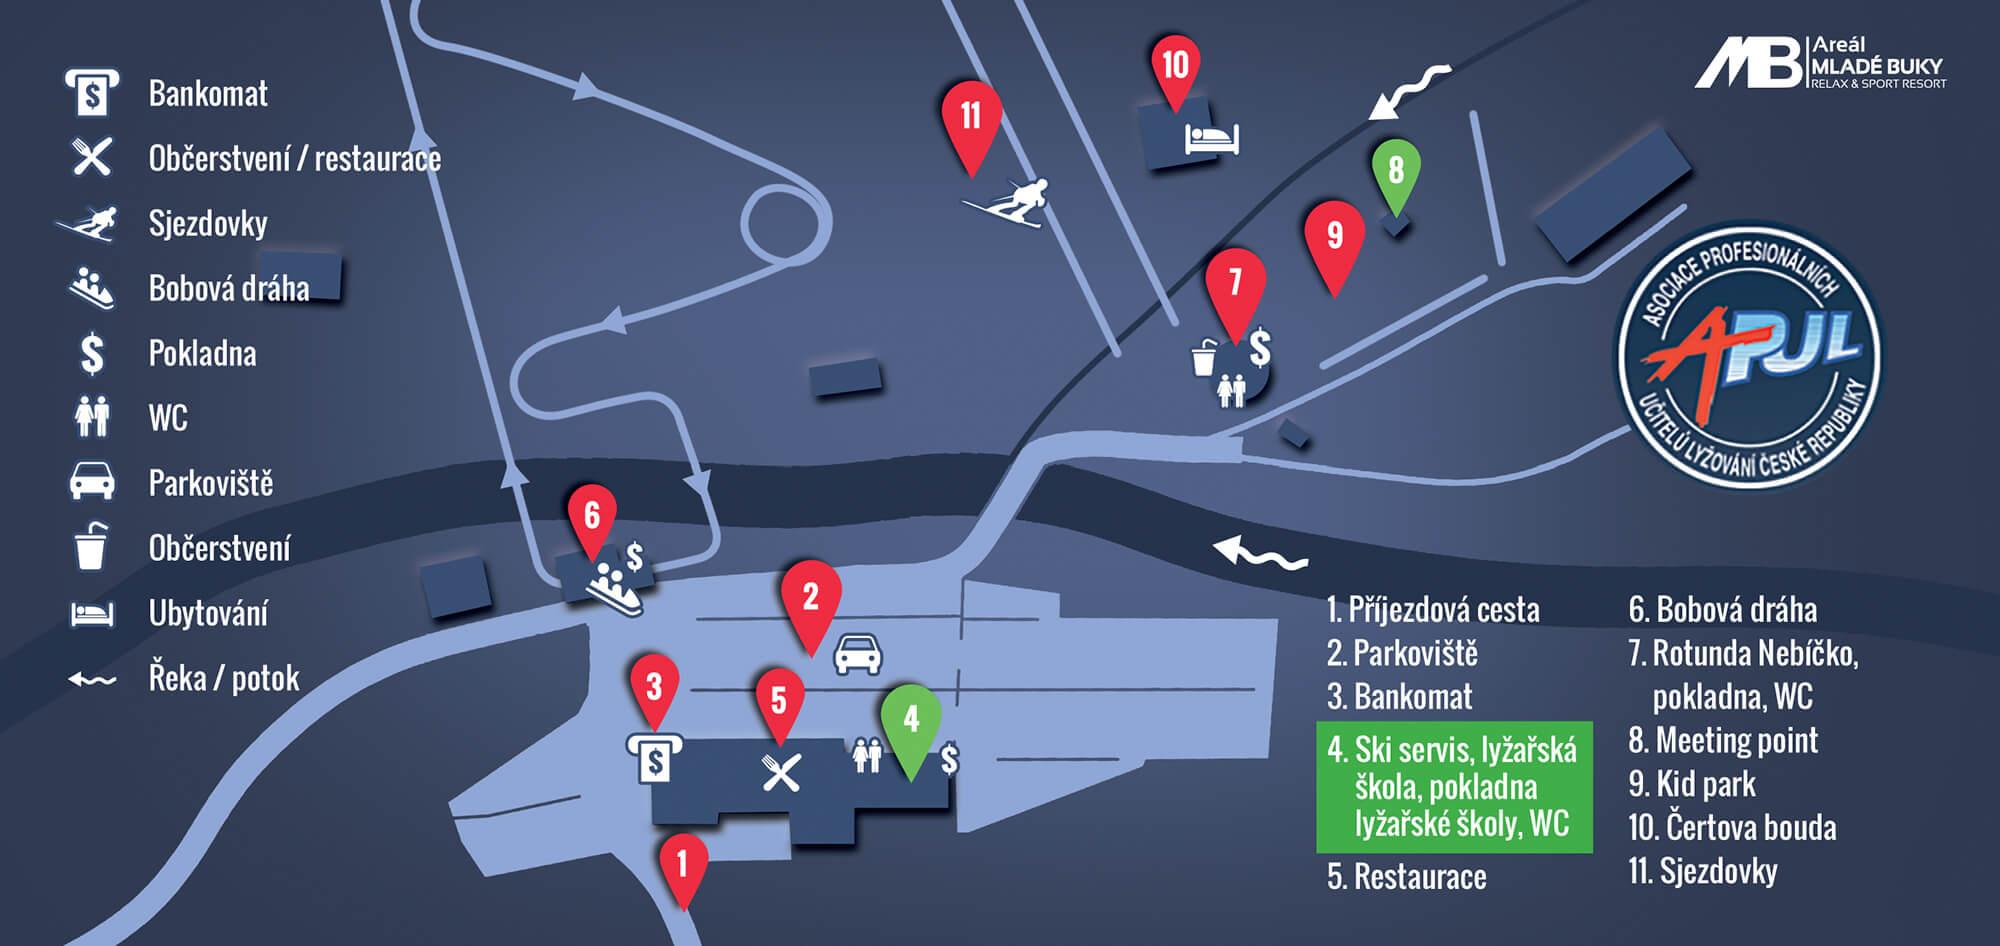 Mapa Areálu Mladé Buky